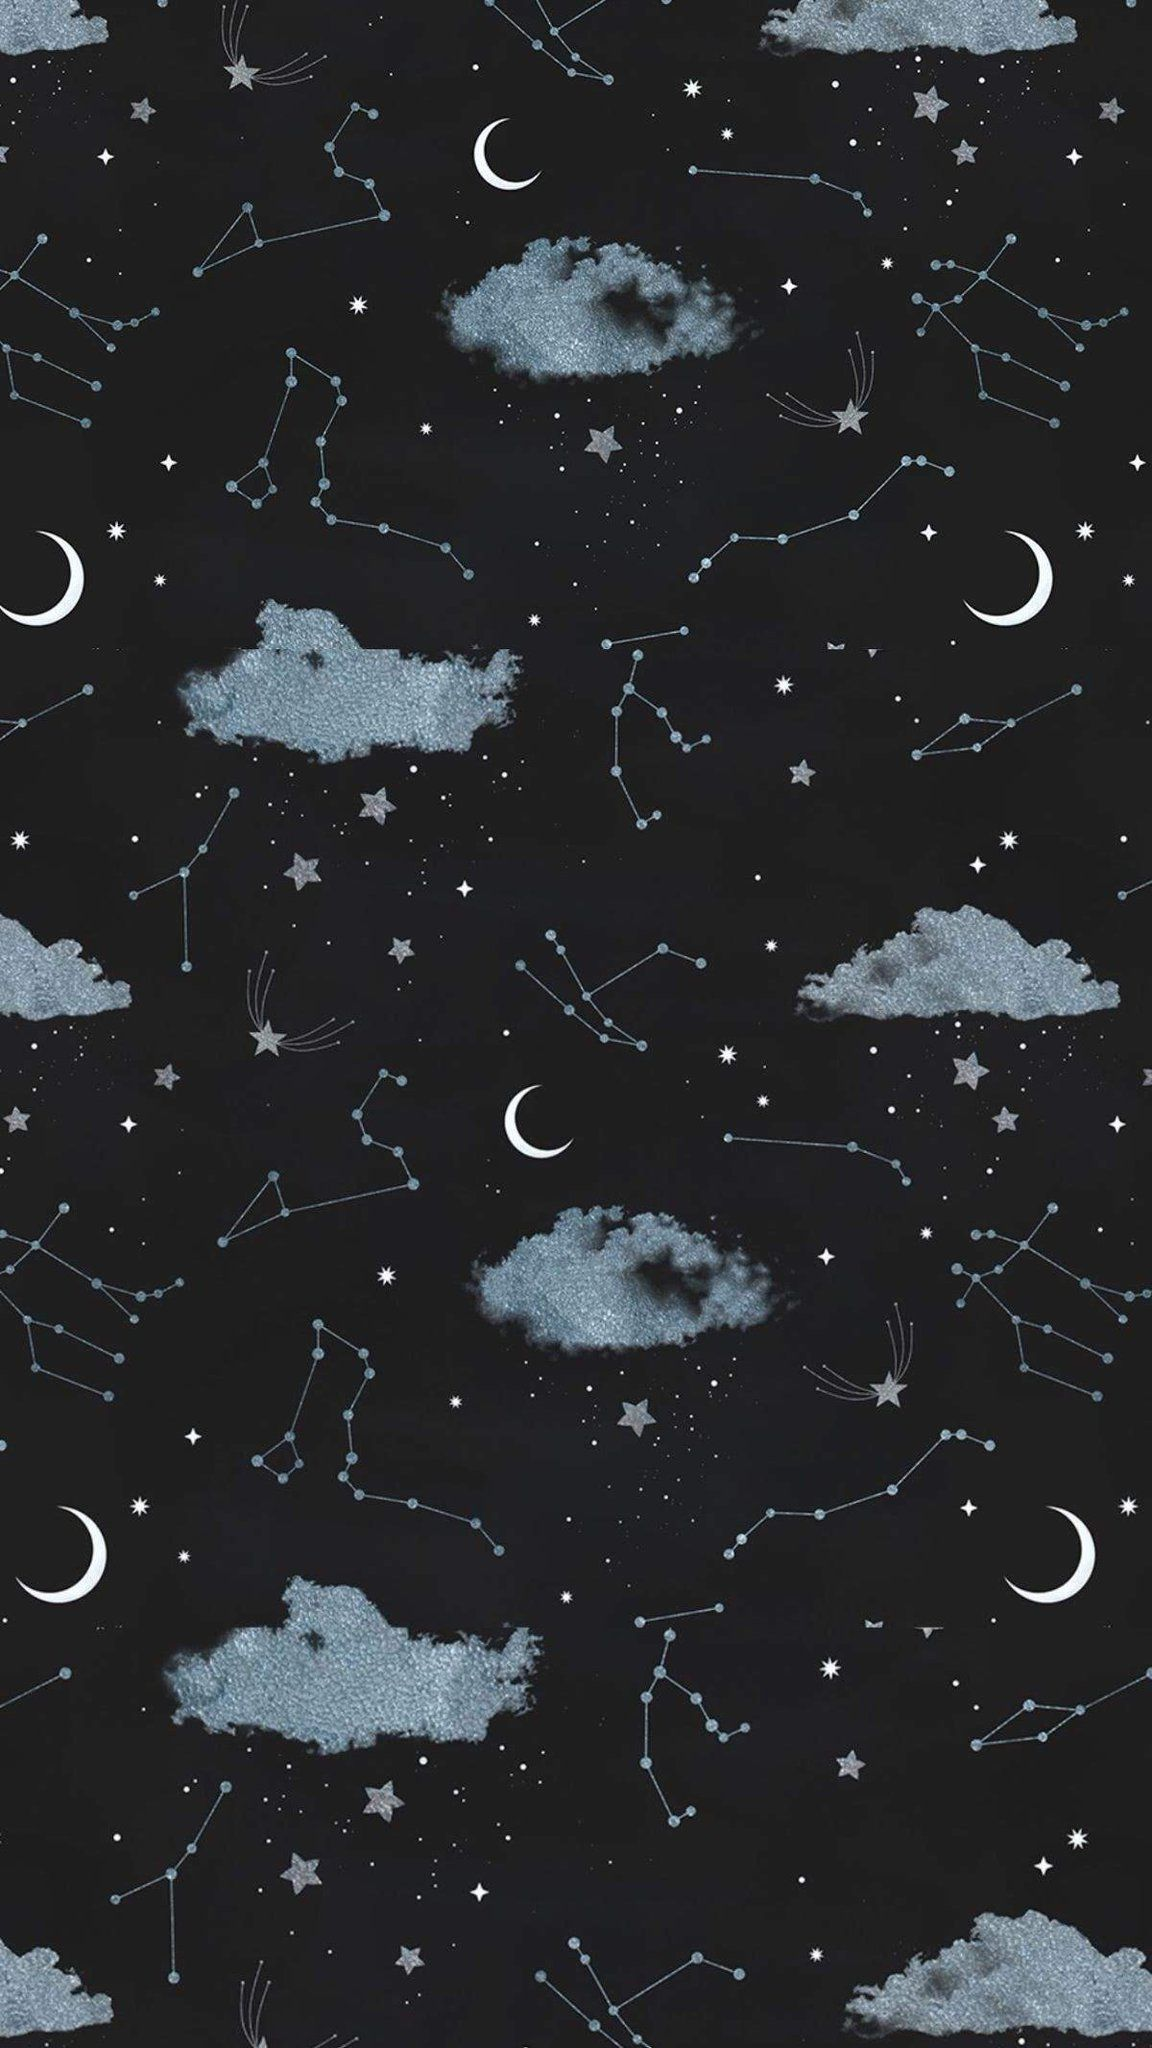 Pinterest Luiselacroix In 2020 Moon And Stars Wallpaper